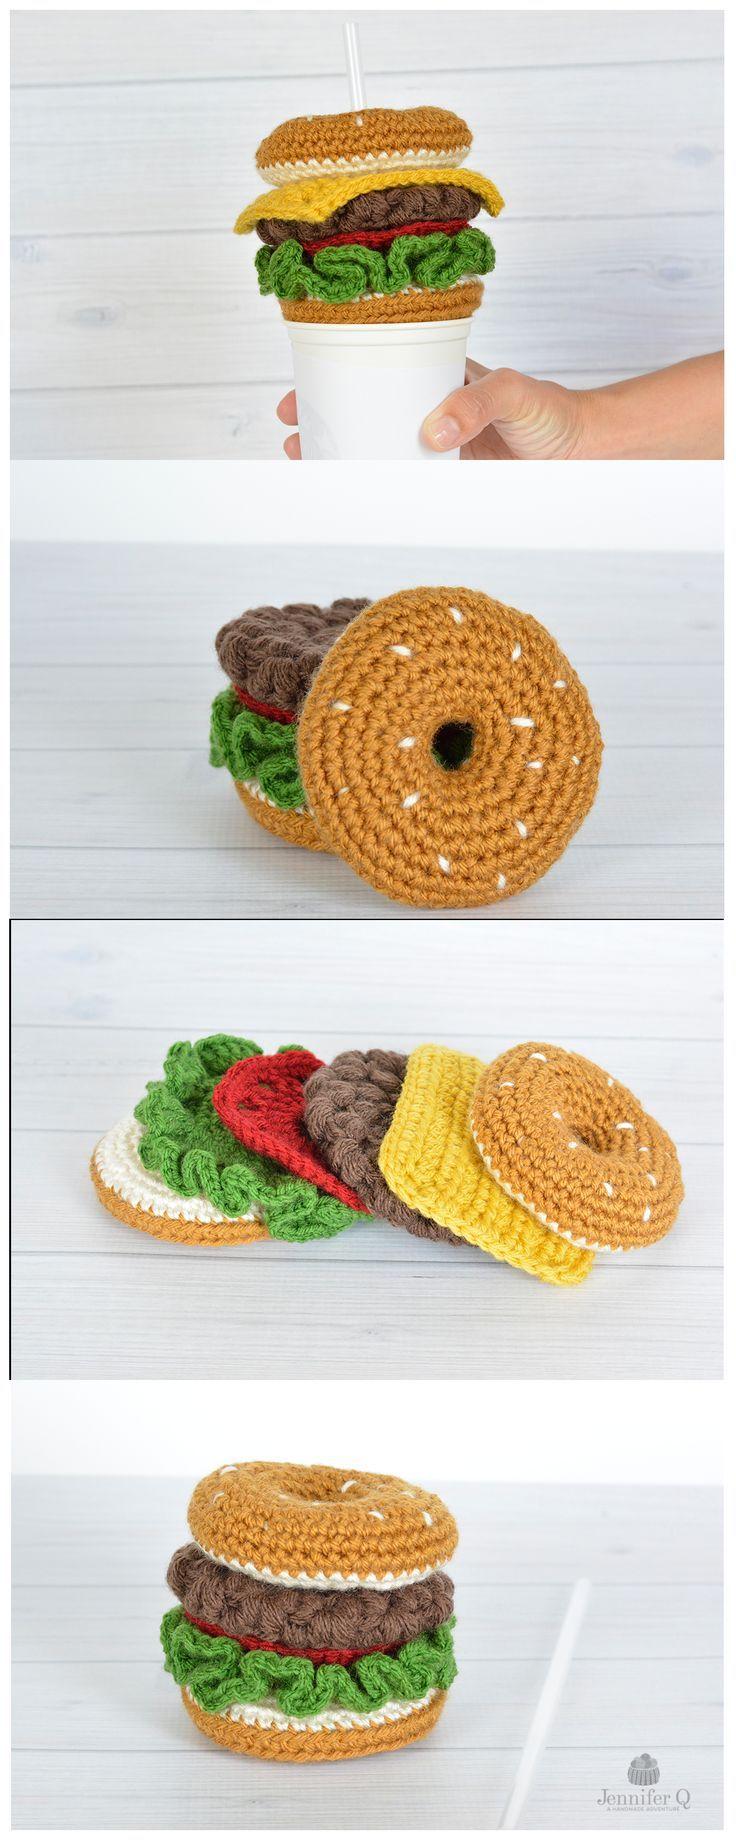 Hamburger Straw free crochet pattern. | Crochet | Pinterest ...